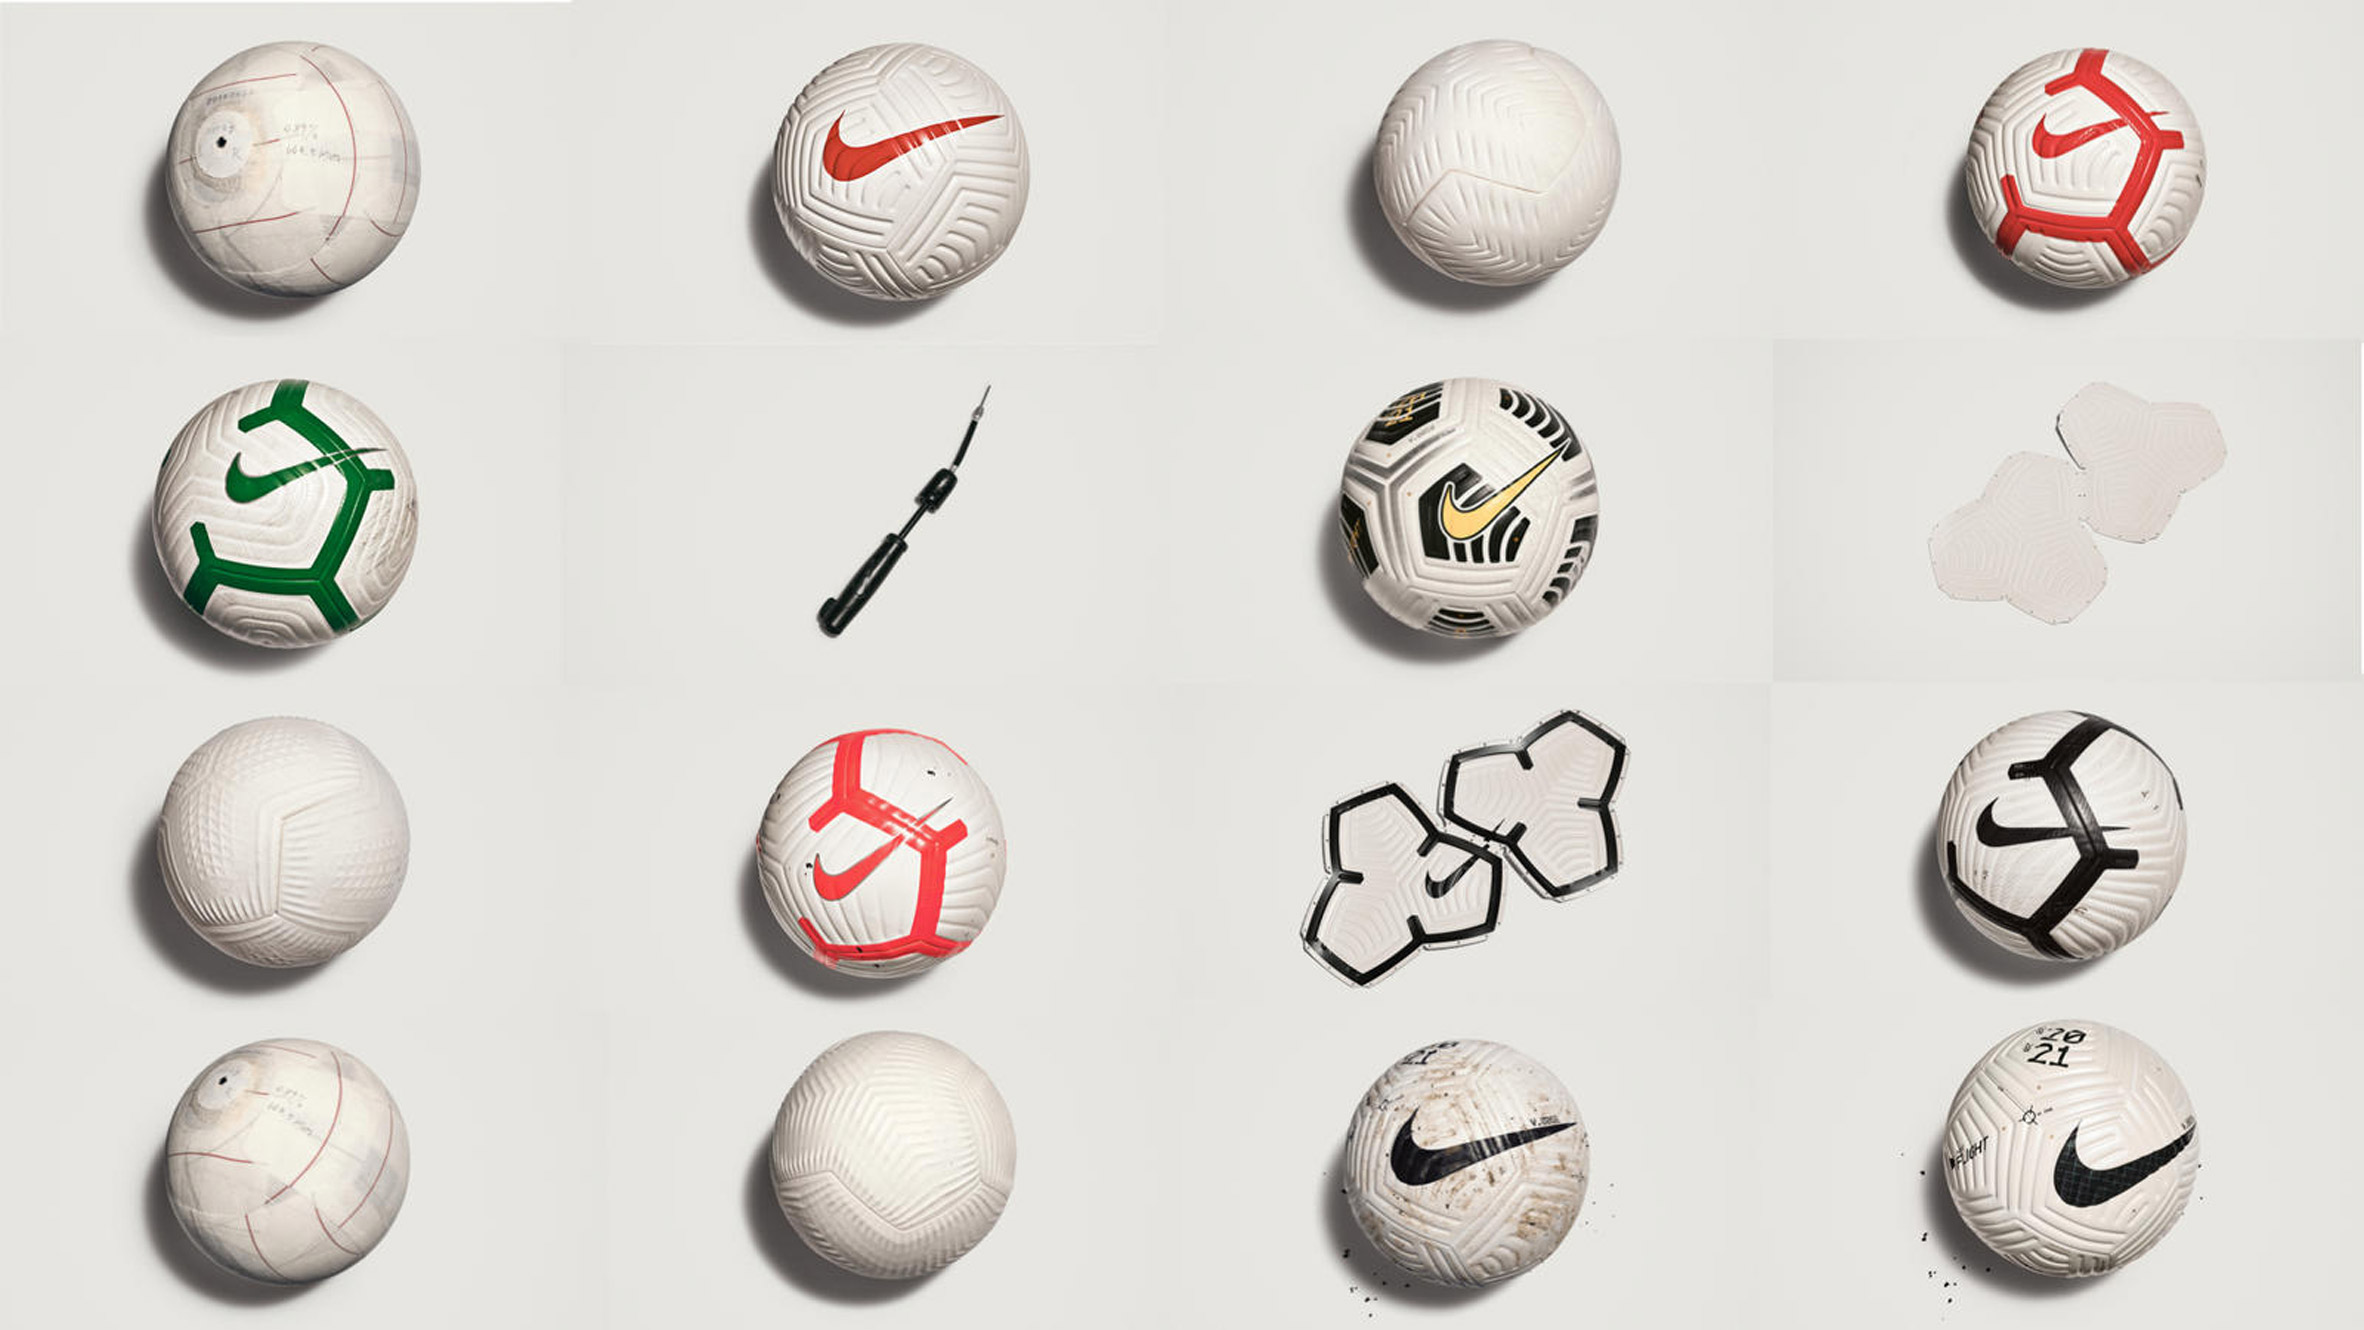 Дизайн мяча Nike